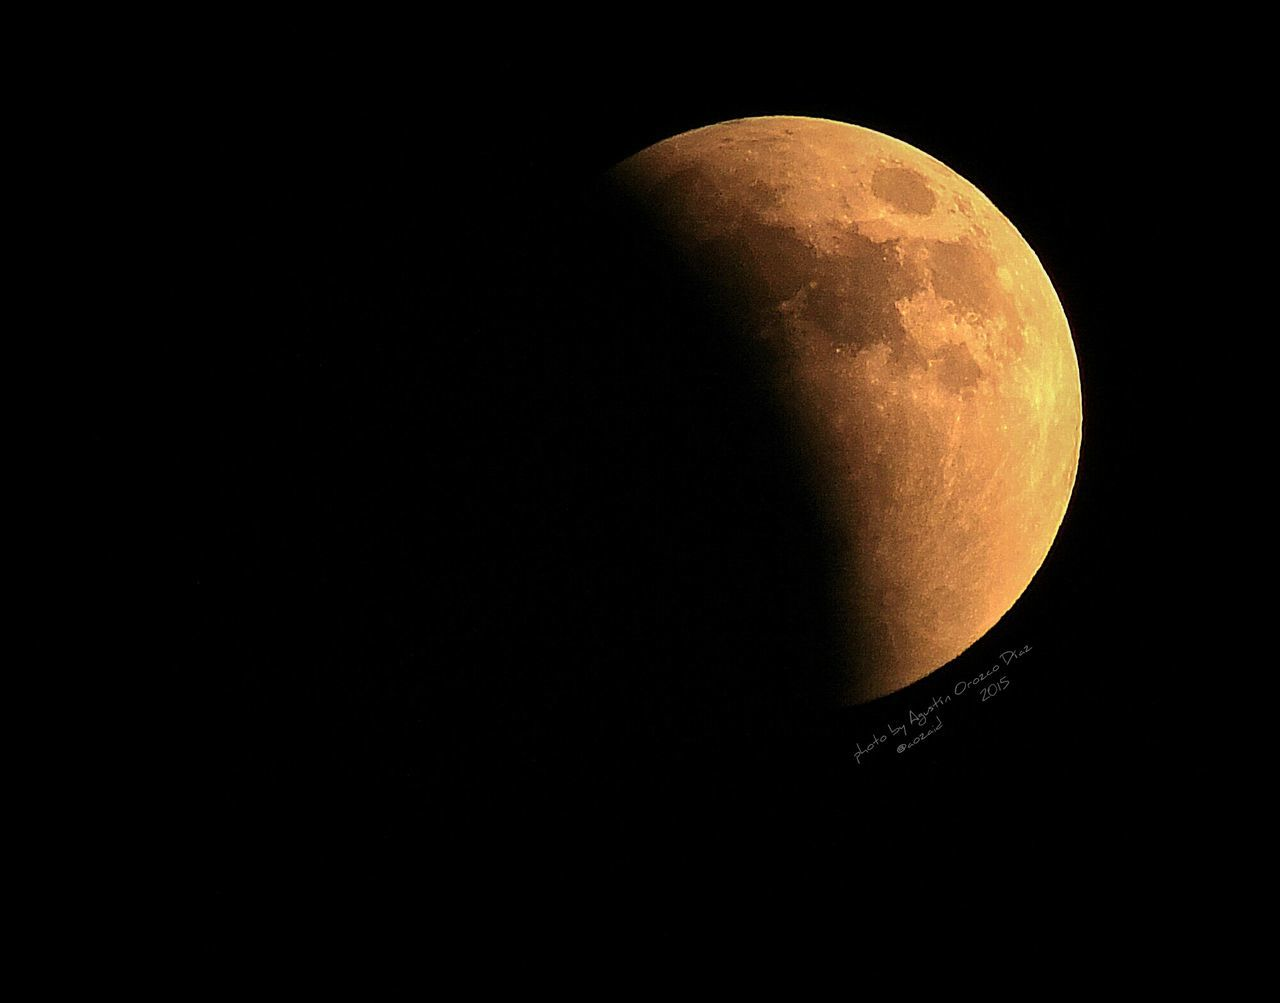 Mega Luna de sangre. Es maravilloso poder presenciar este espectaculo. Photo By Agustín Orozco Díaz - 2015 Eclipse Lunar 27 de Septiembre del 2015